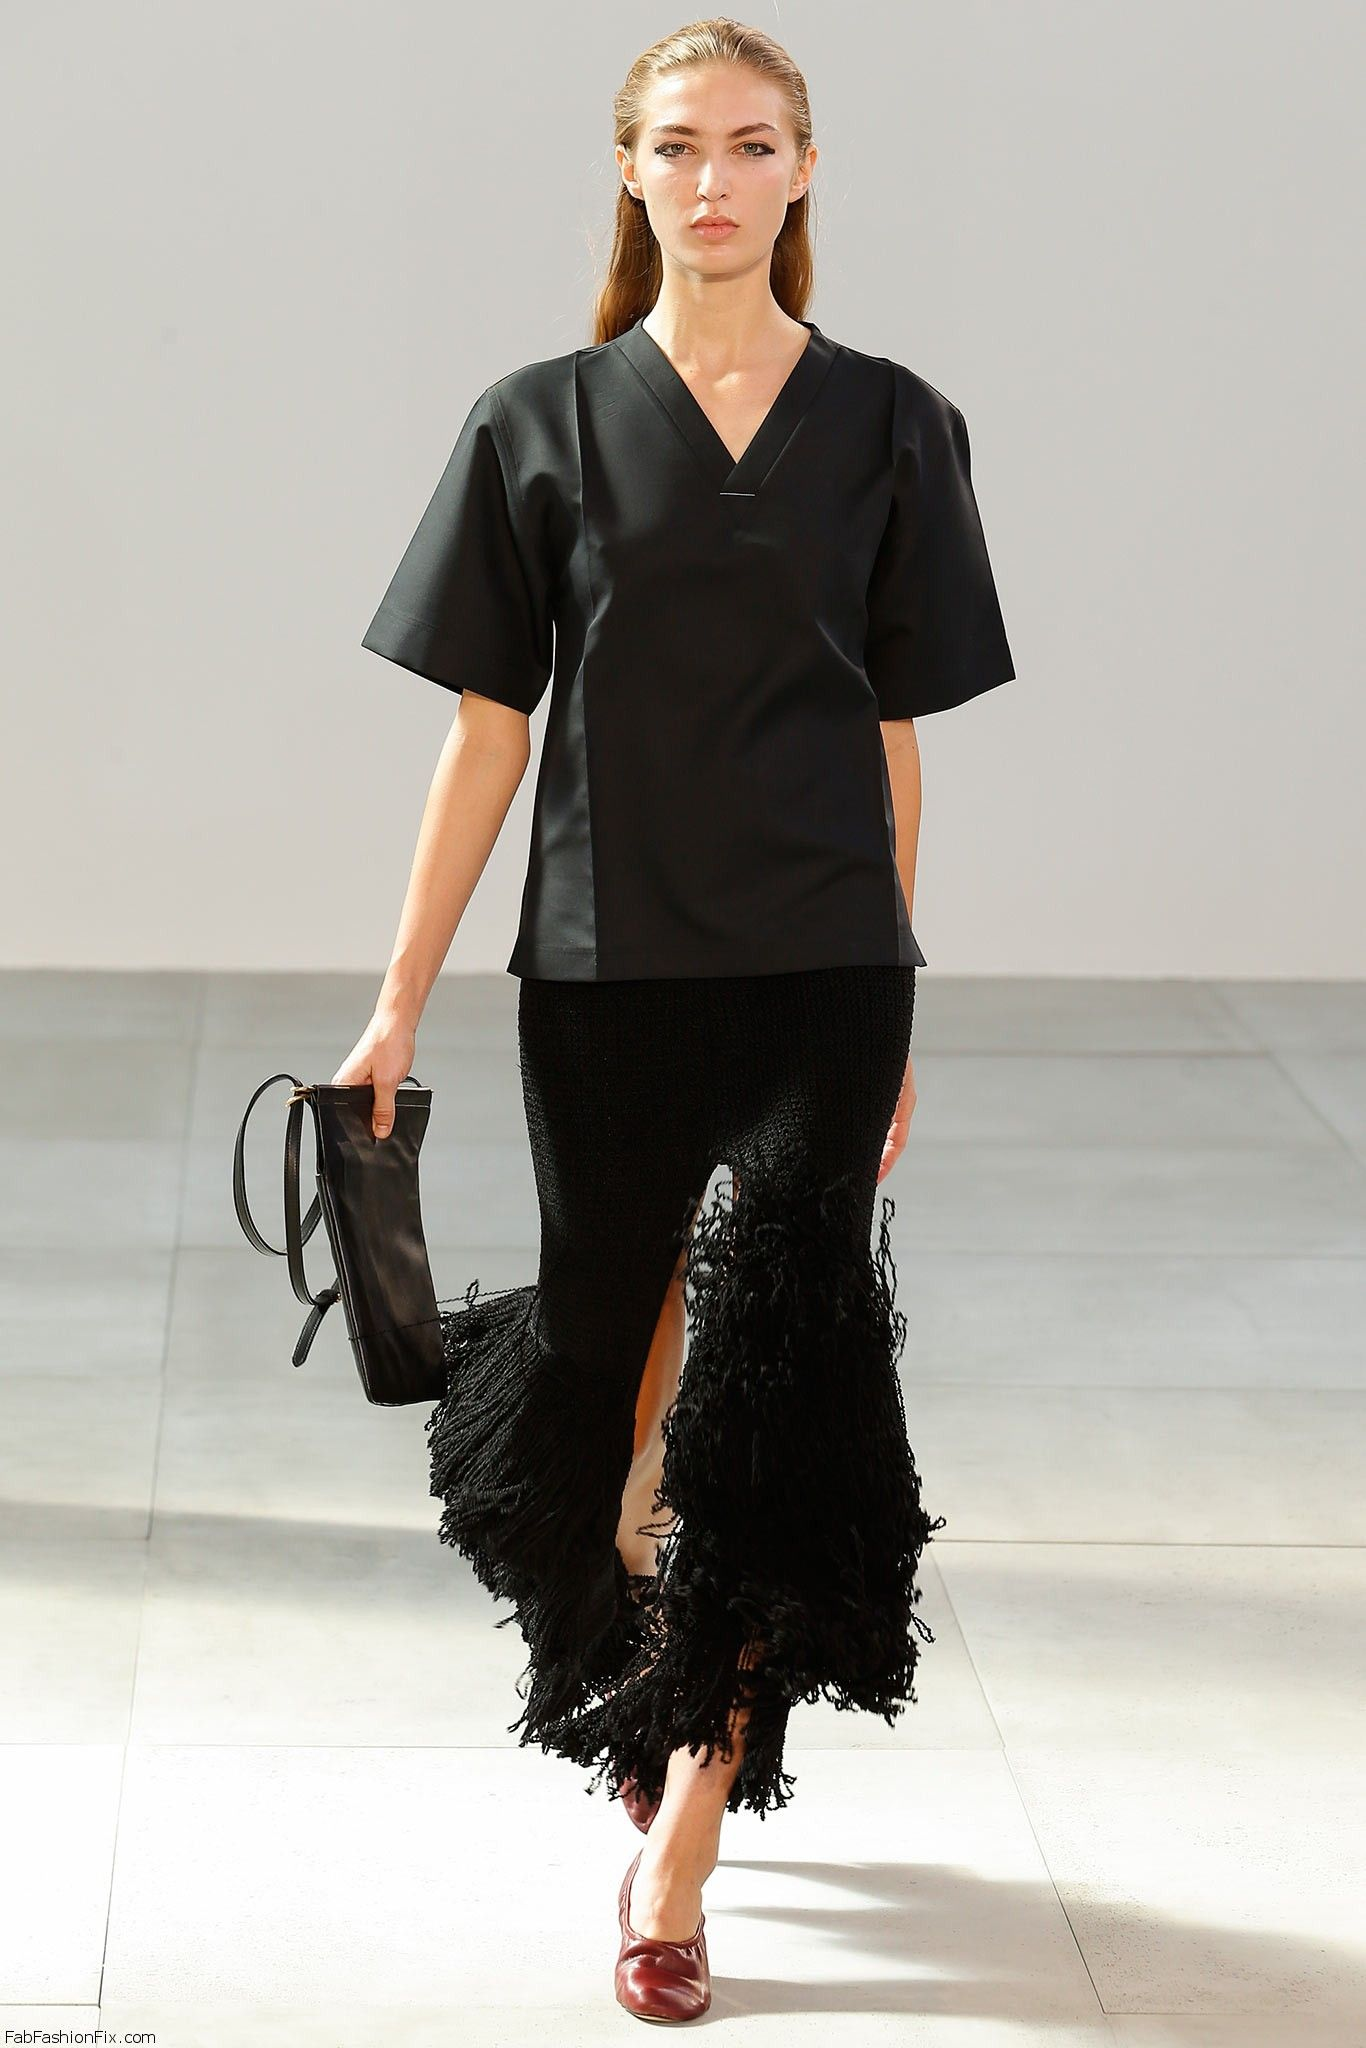 céline spring/summer 2015 collection – paris fashion week | fab